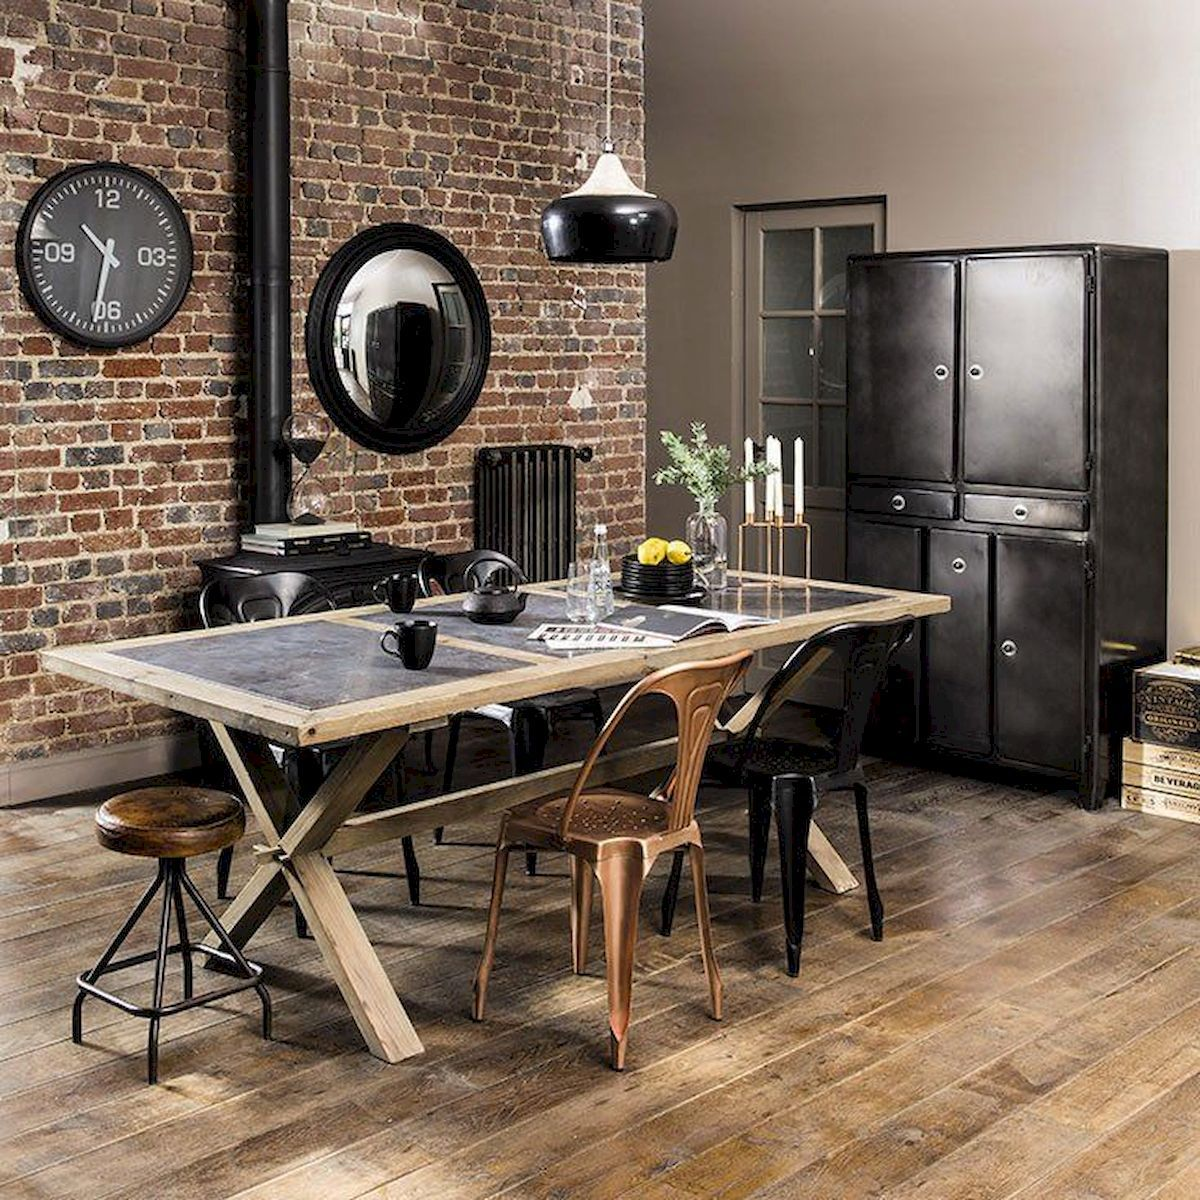 Industrial Kitchen Furniture: Decor Inspiration For Home Kitchen